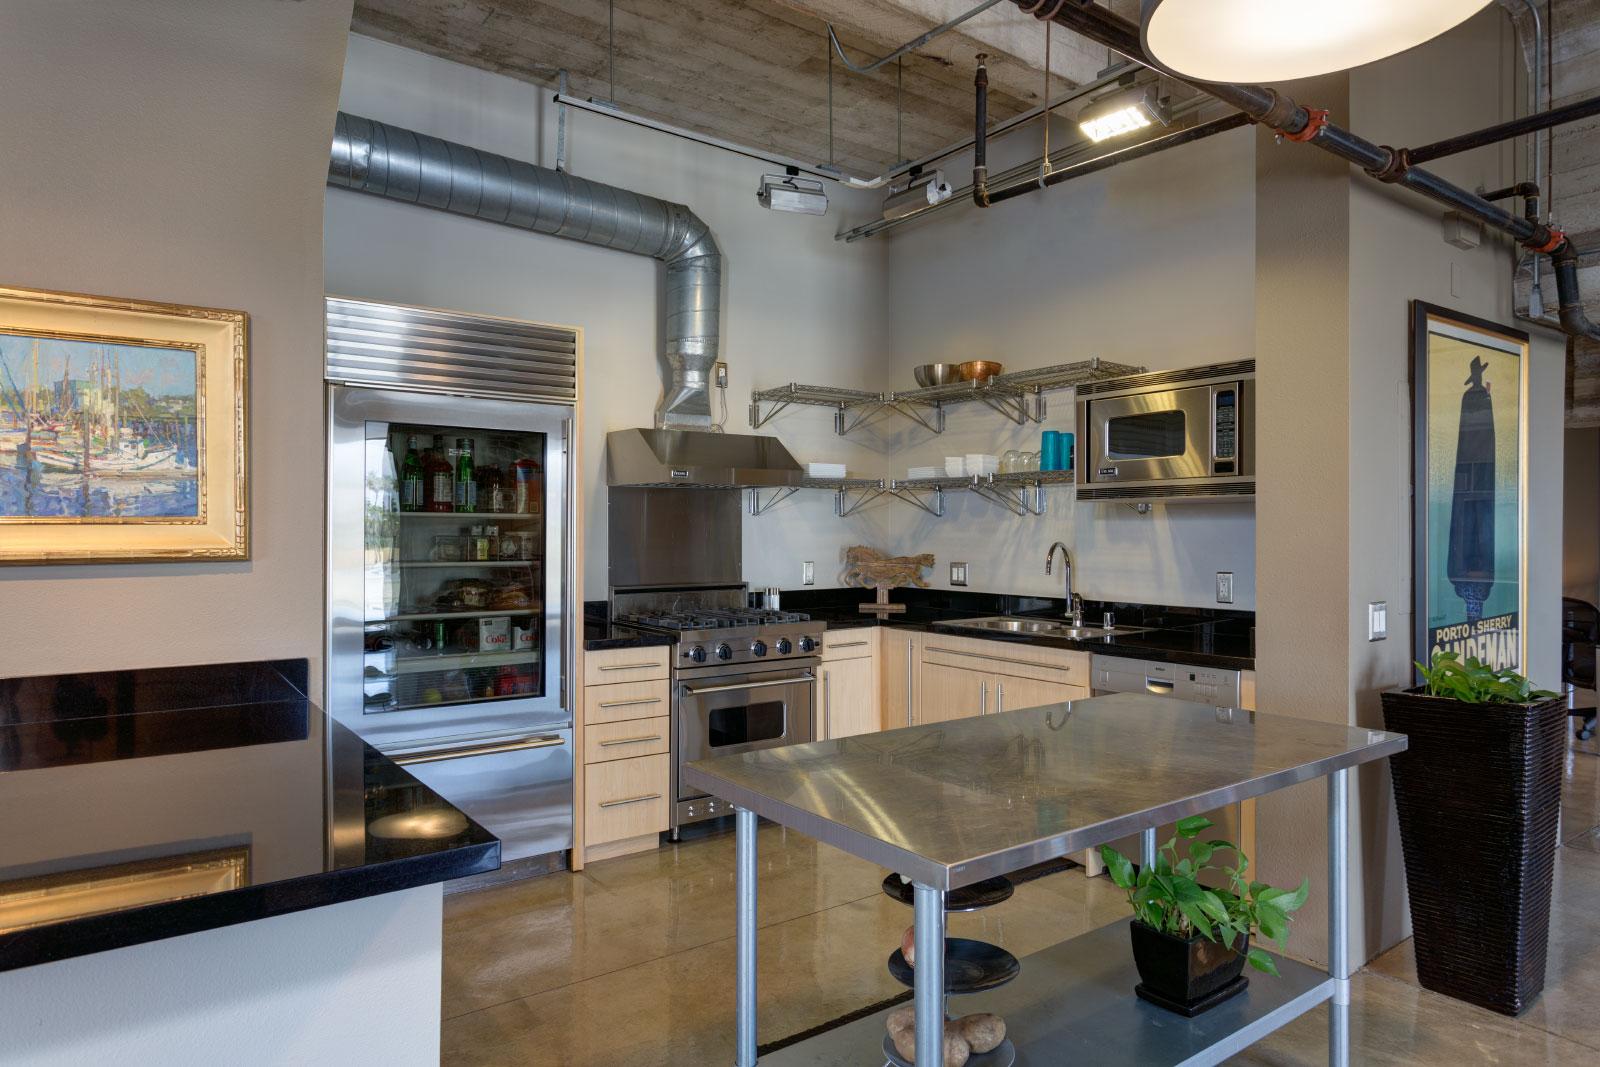 kitchen_12844276543_o.jpg